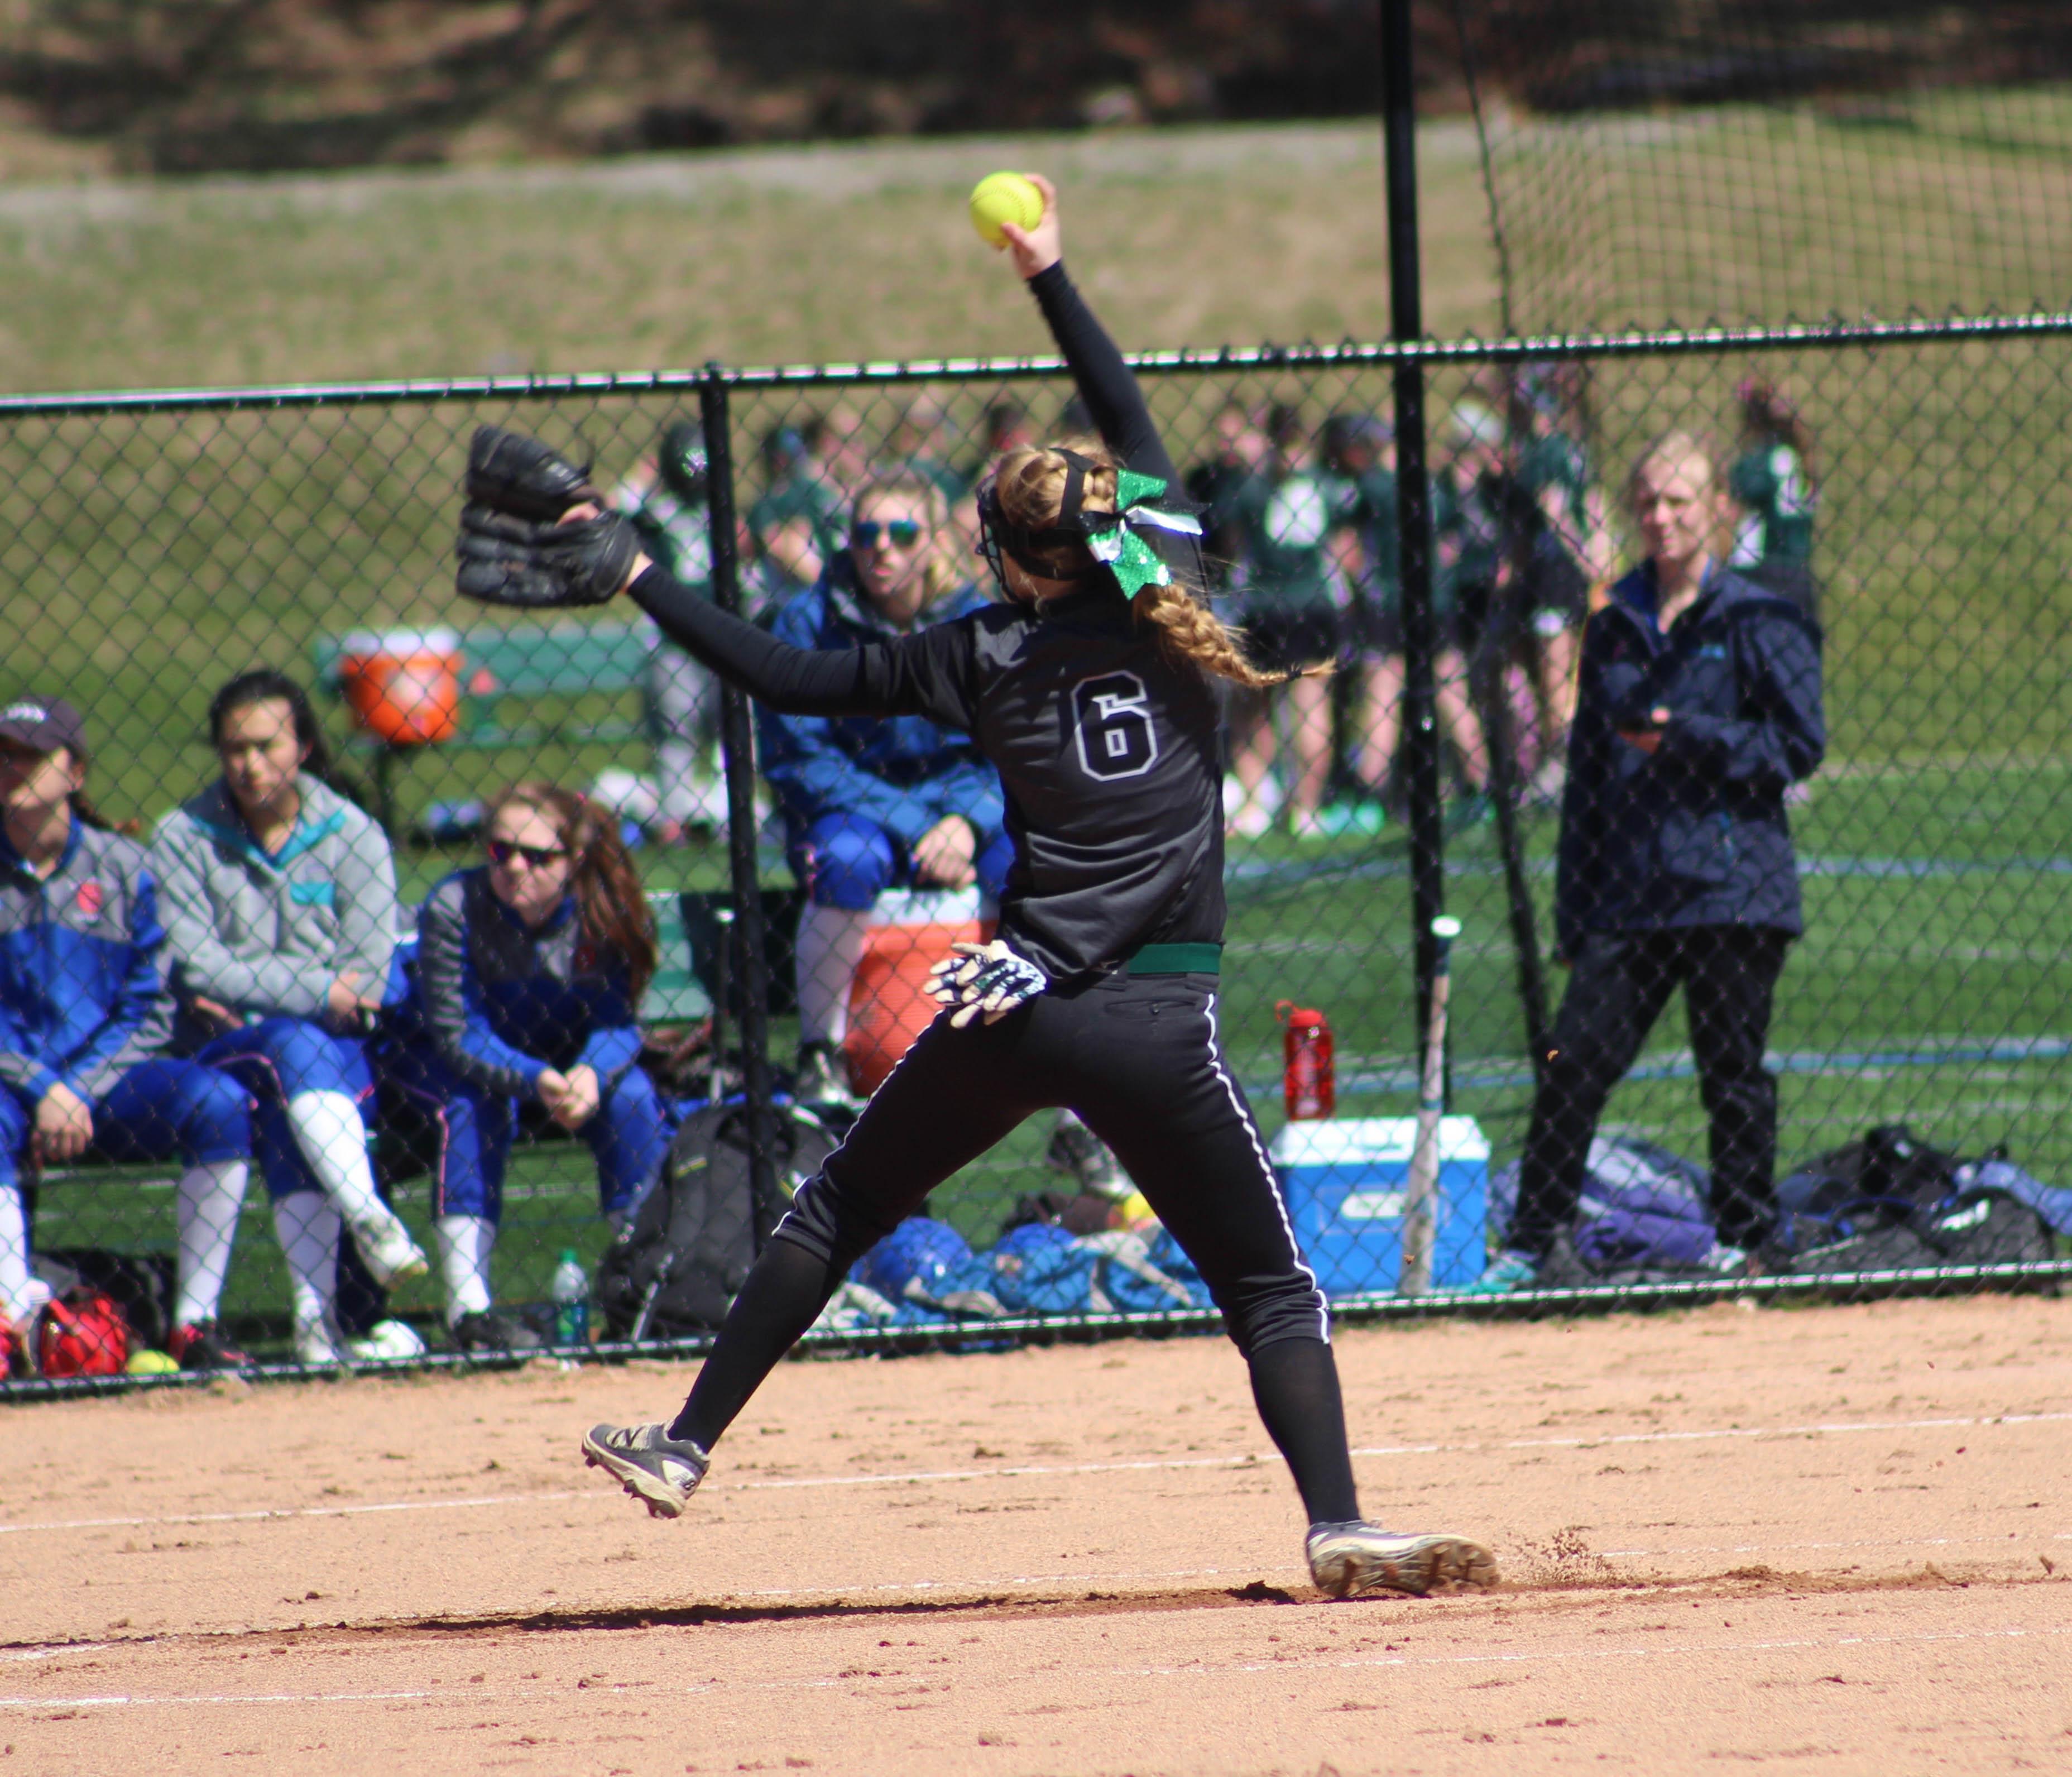 Proctor Academy softball